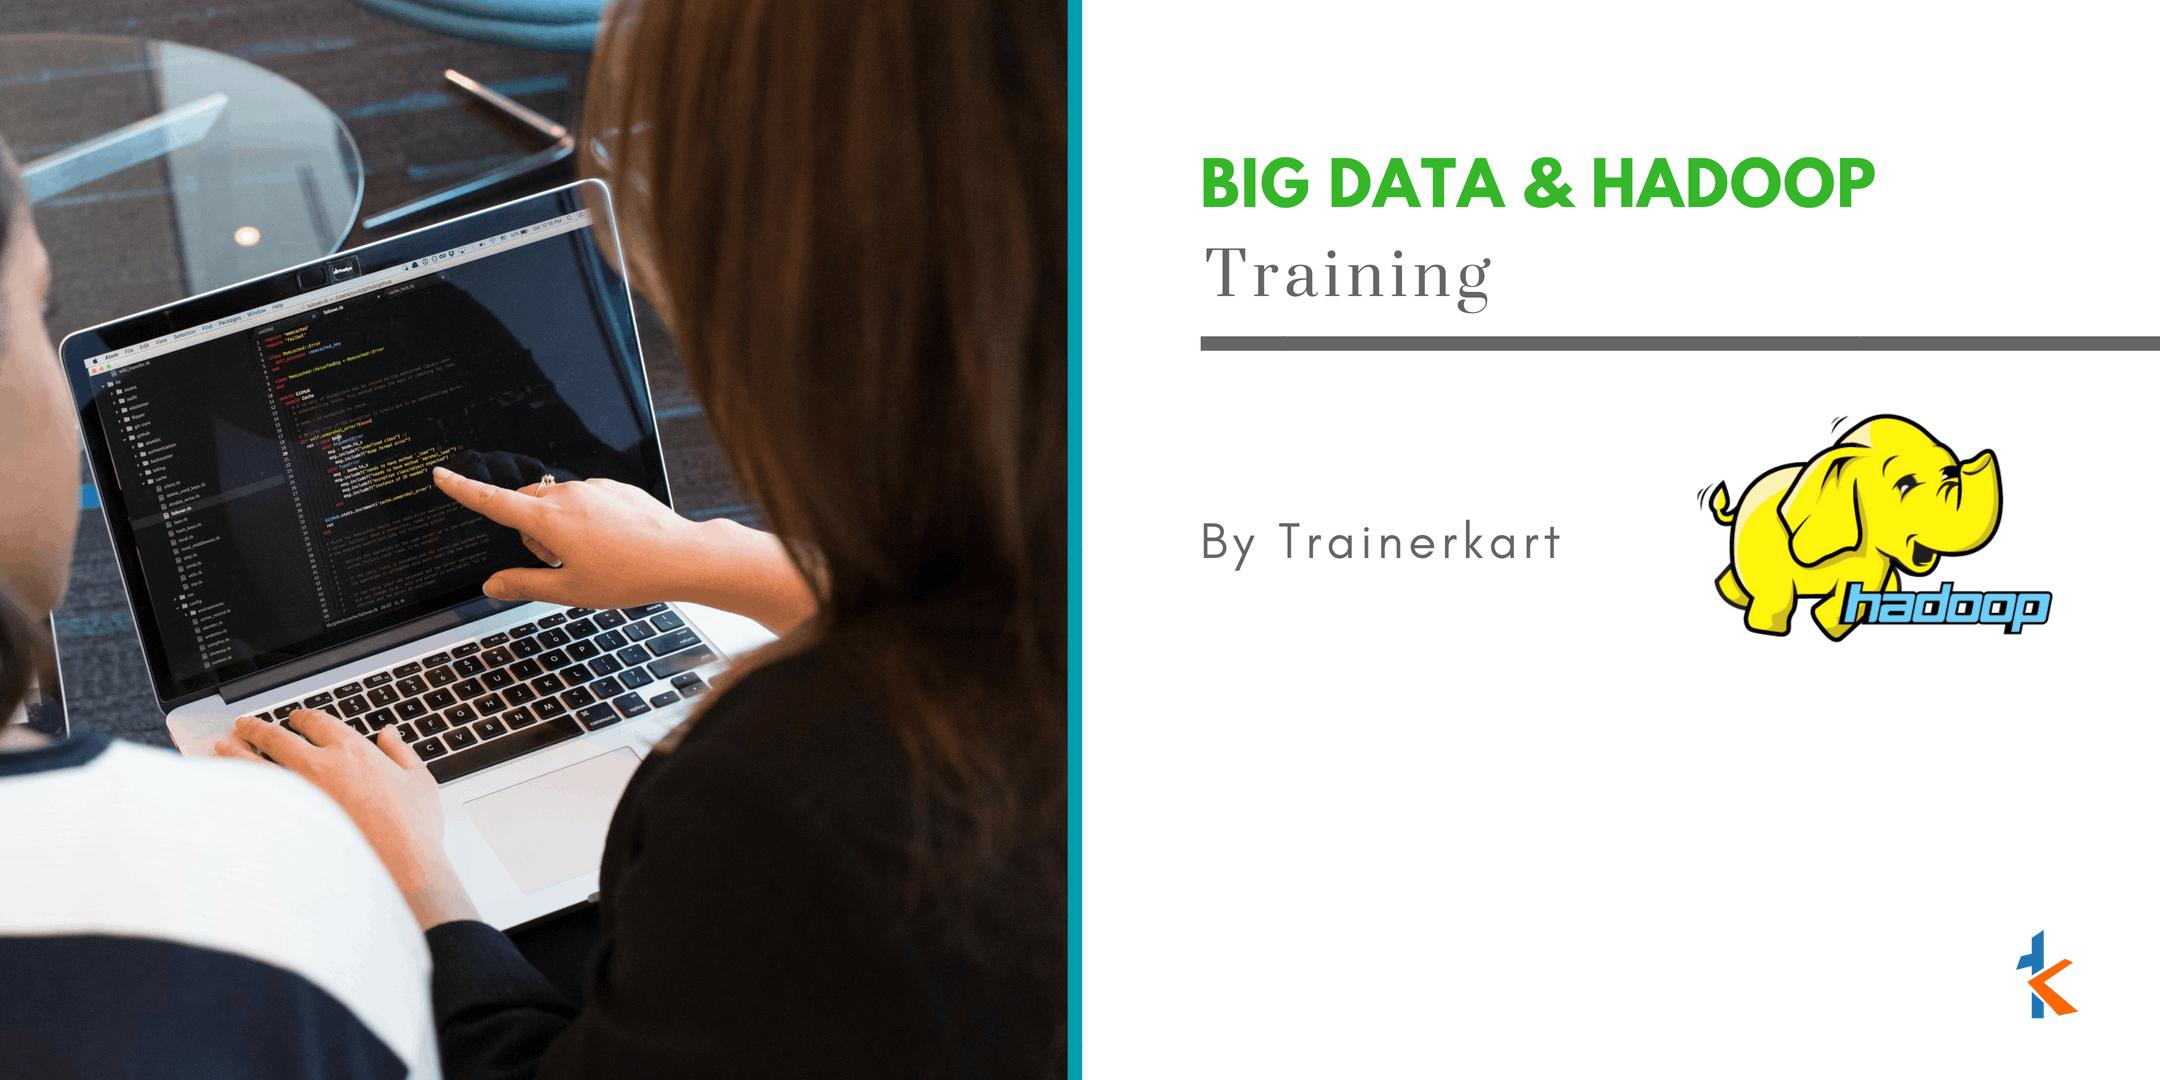 Big Data and Hadoop Classroom Training in Can